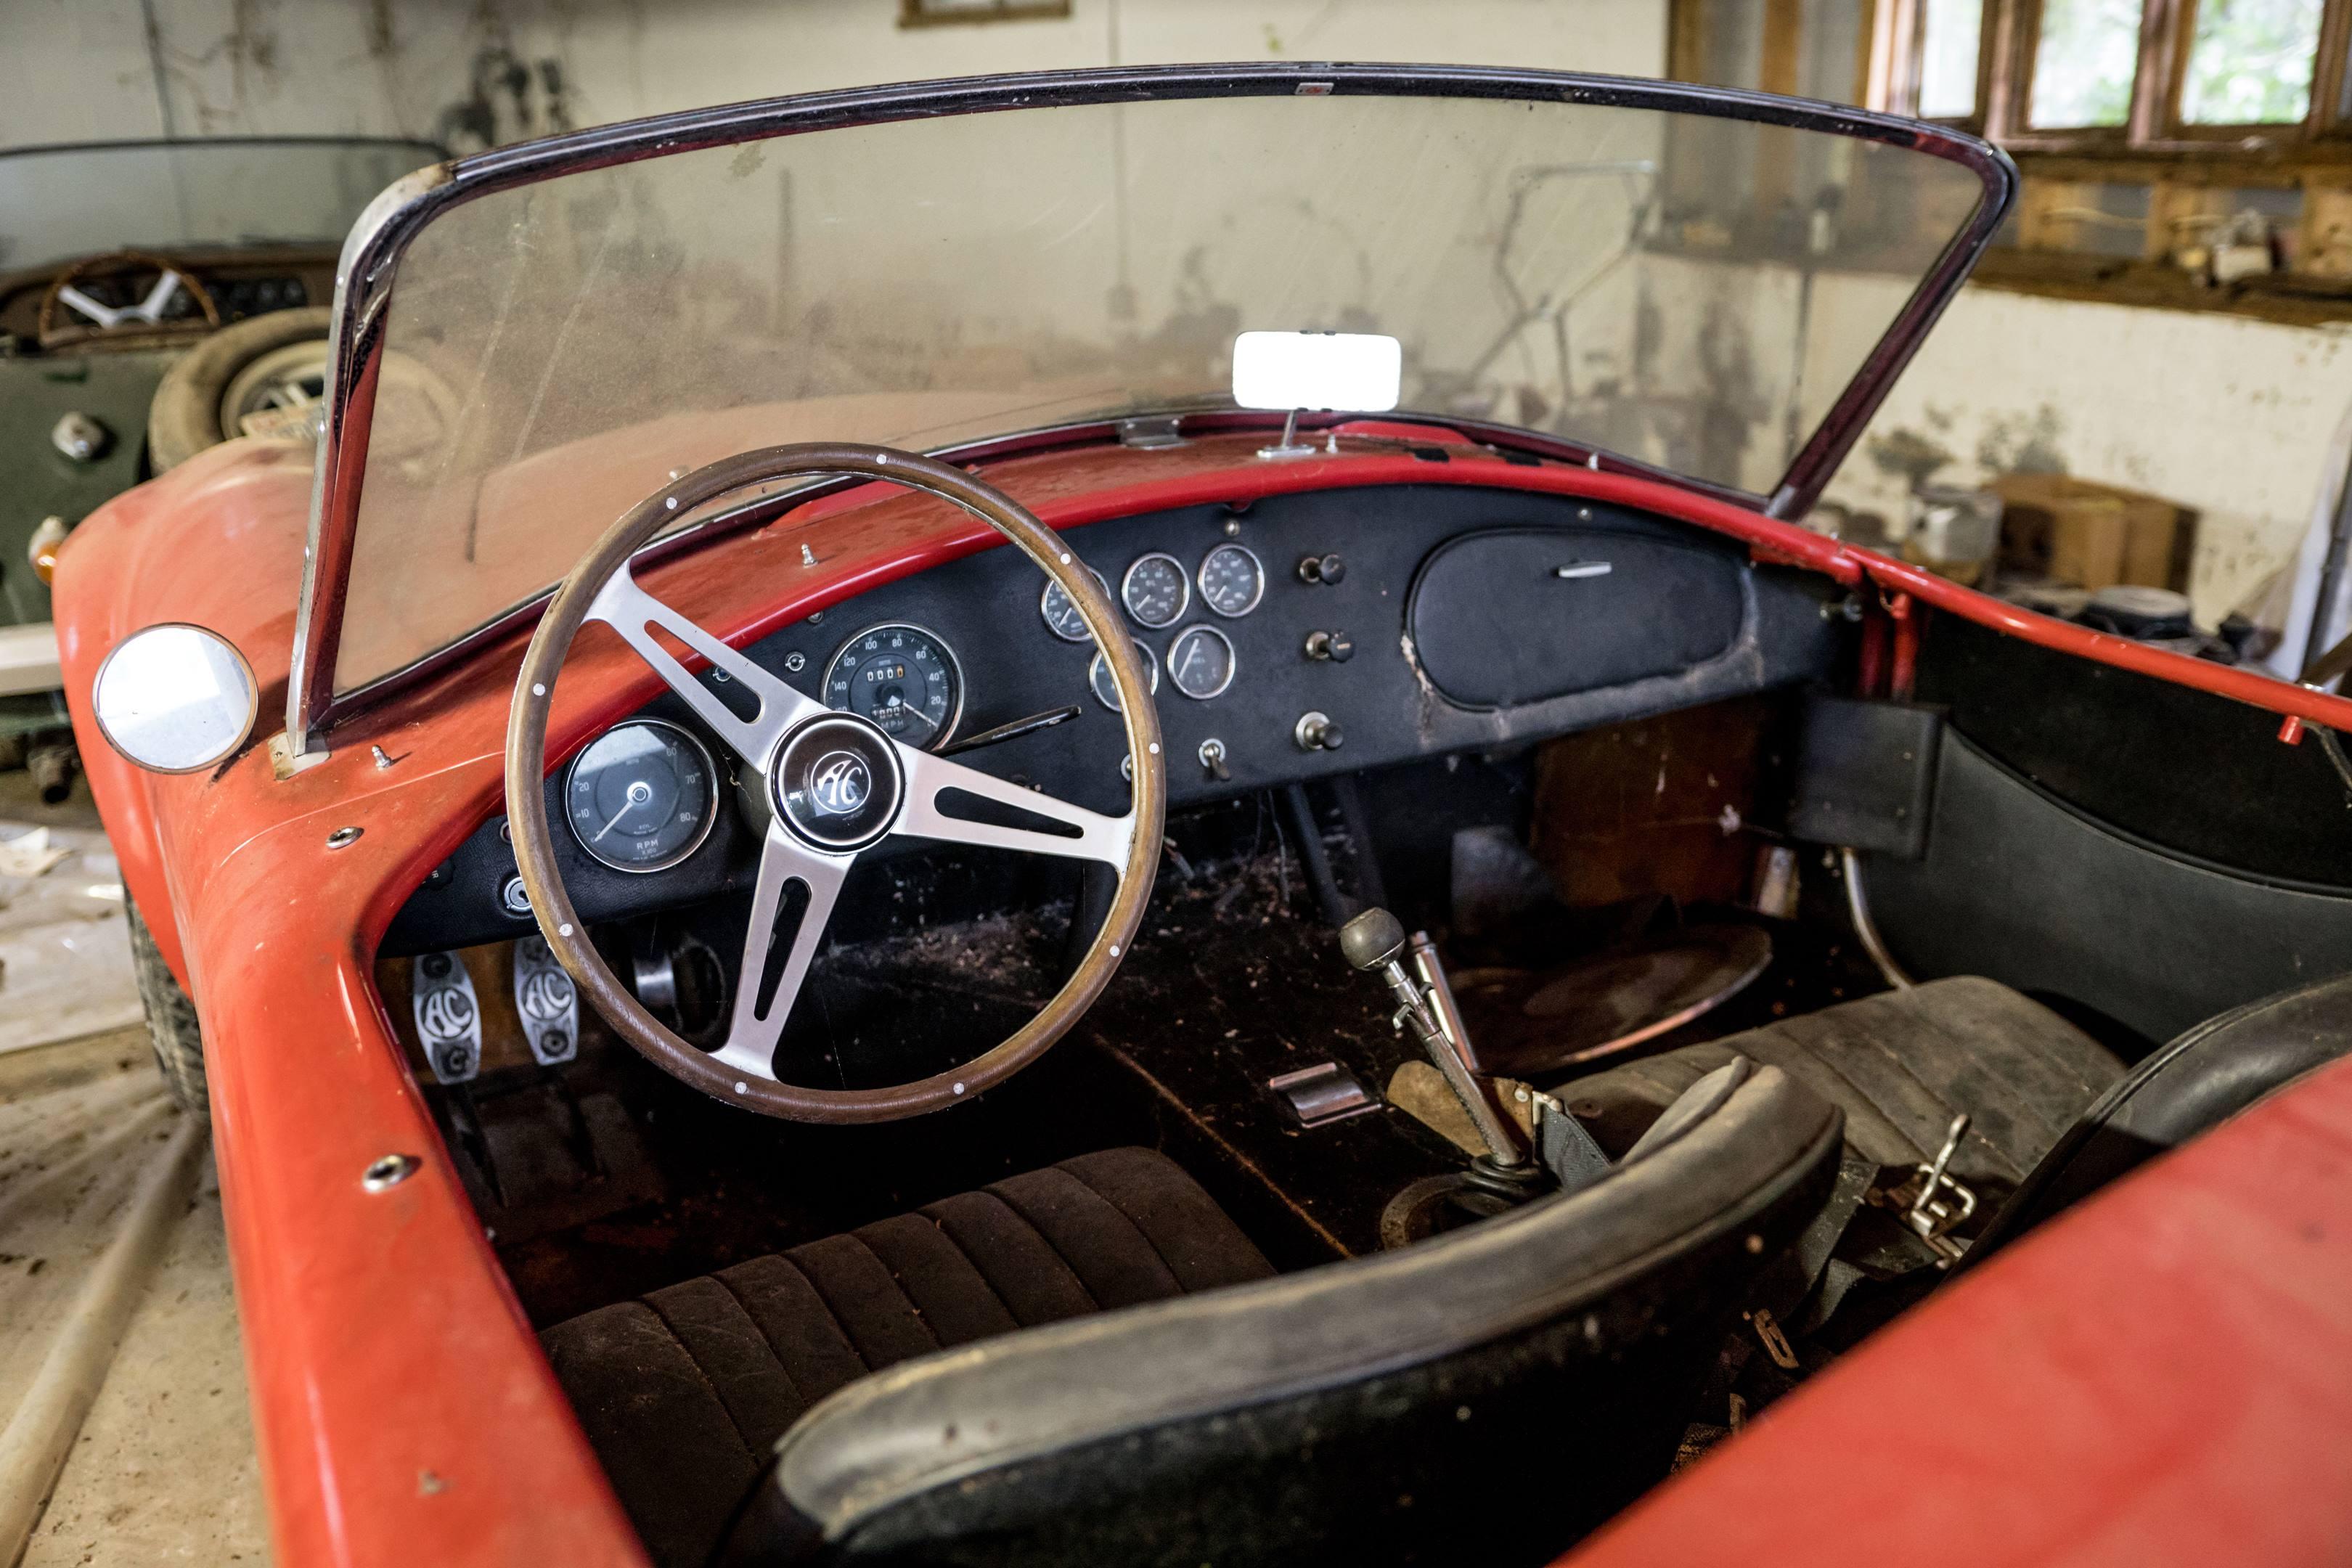 barn find 427 Shelby Cobra interior